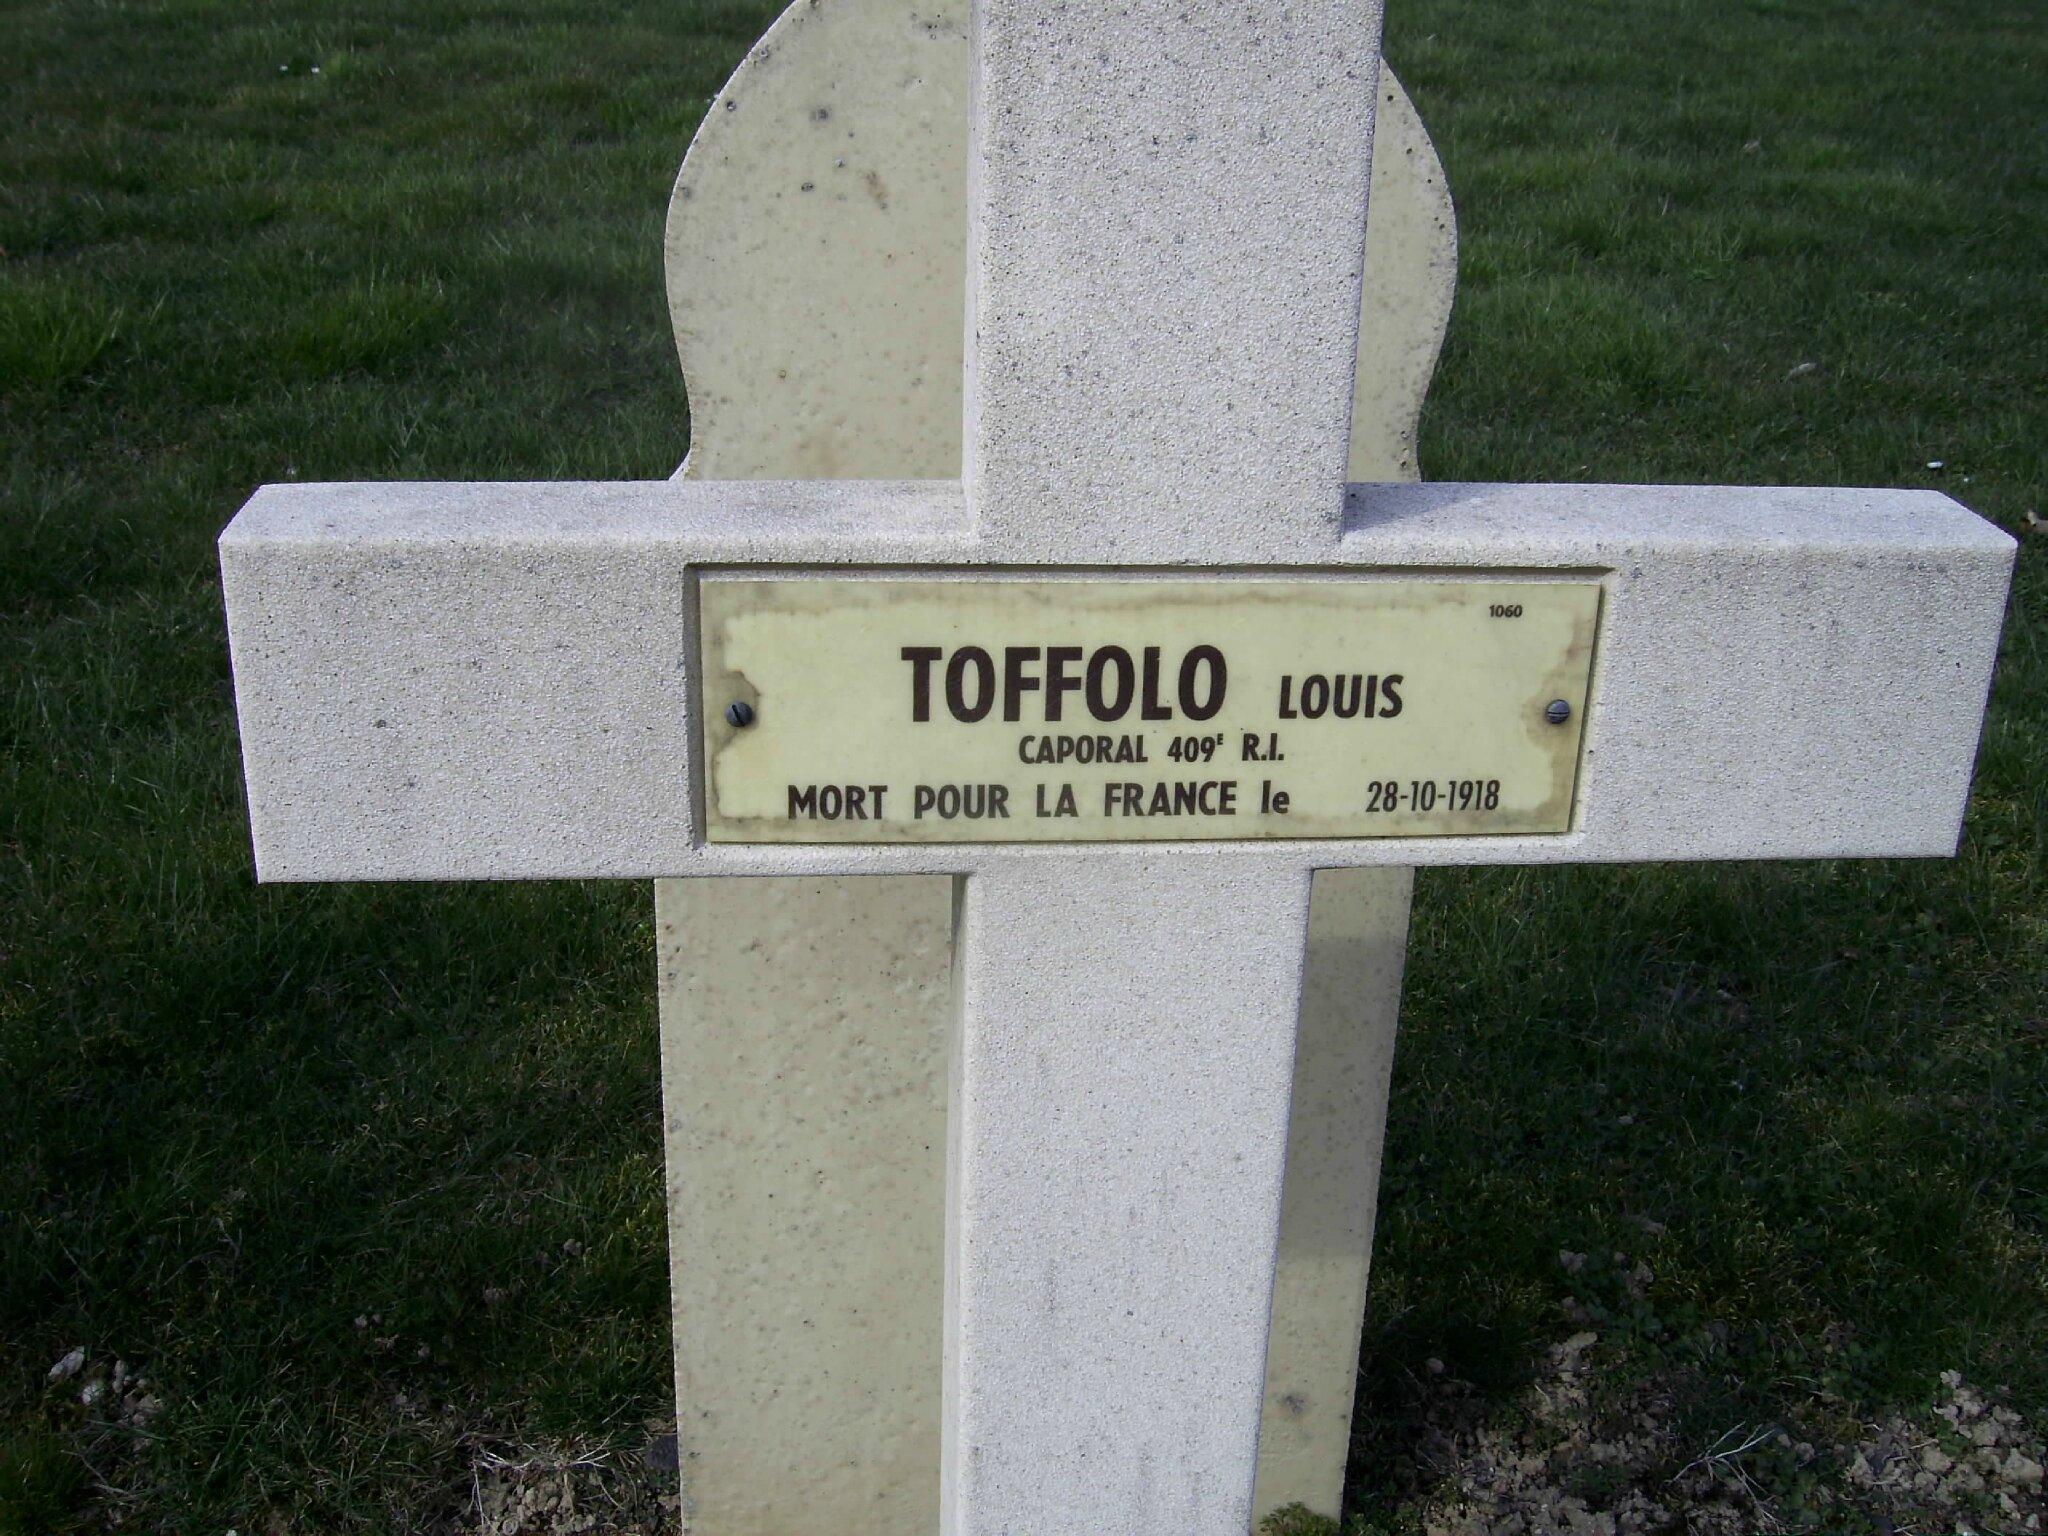 TOFFOLO Louis